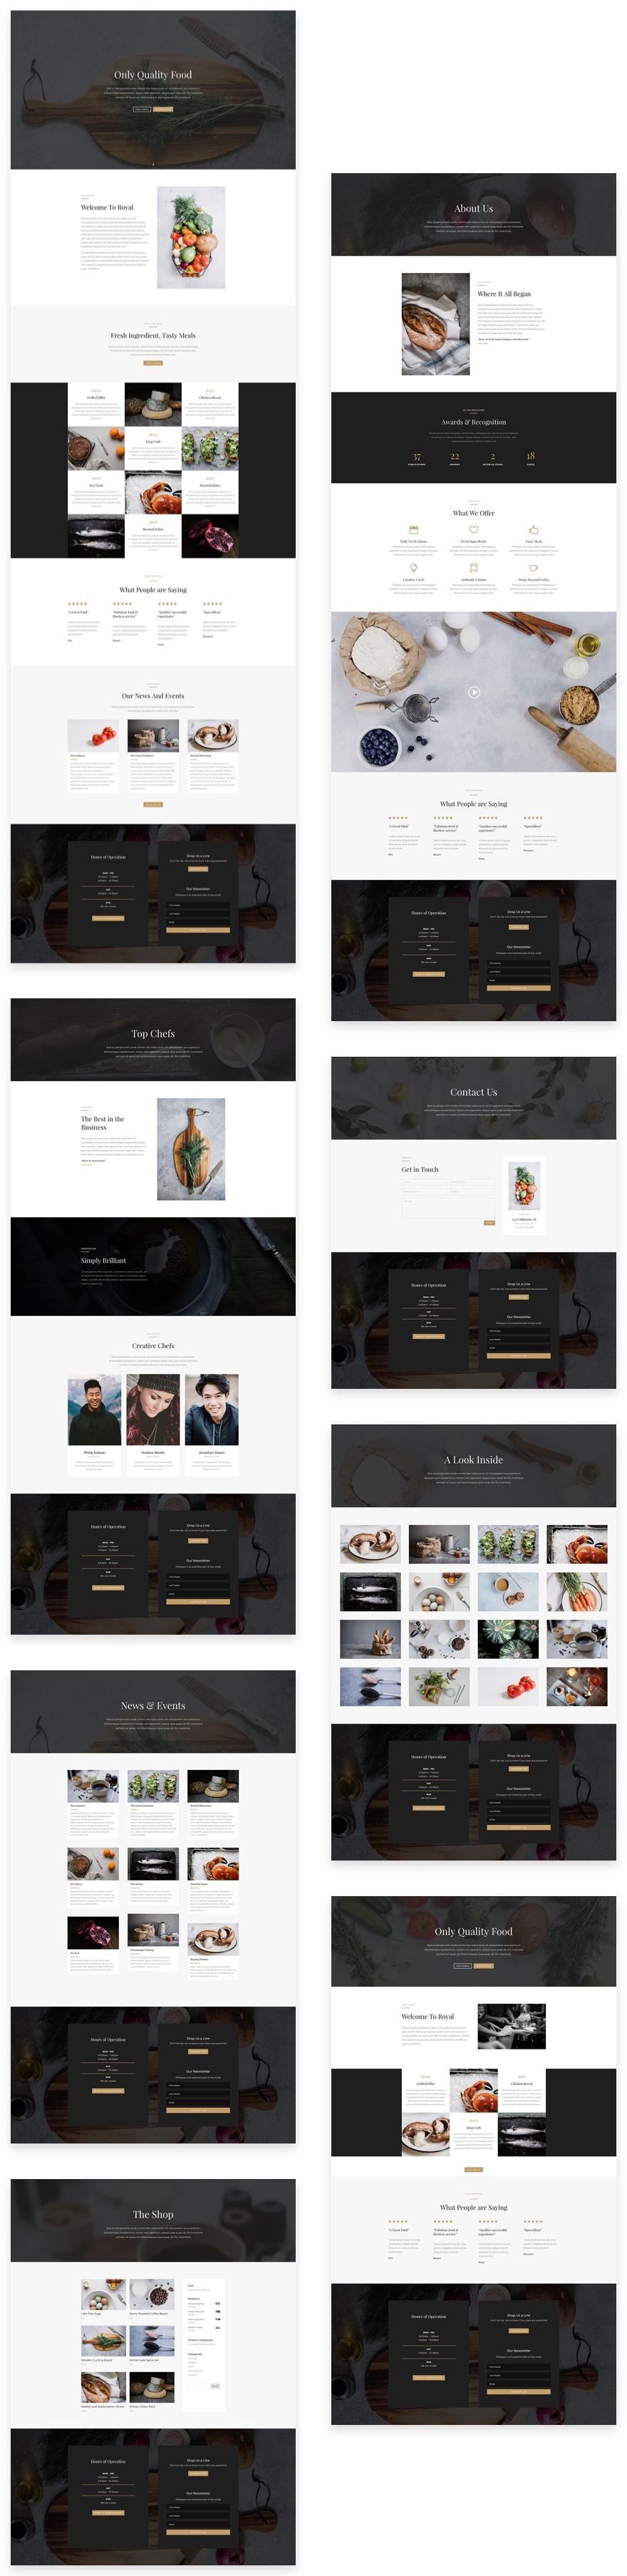 divi-restaurant-layout-pack-grid-1